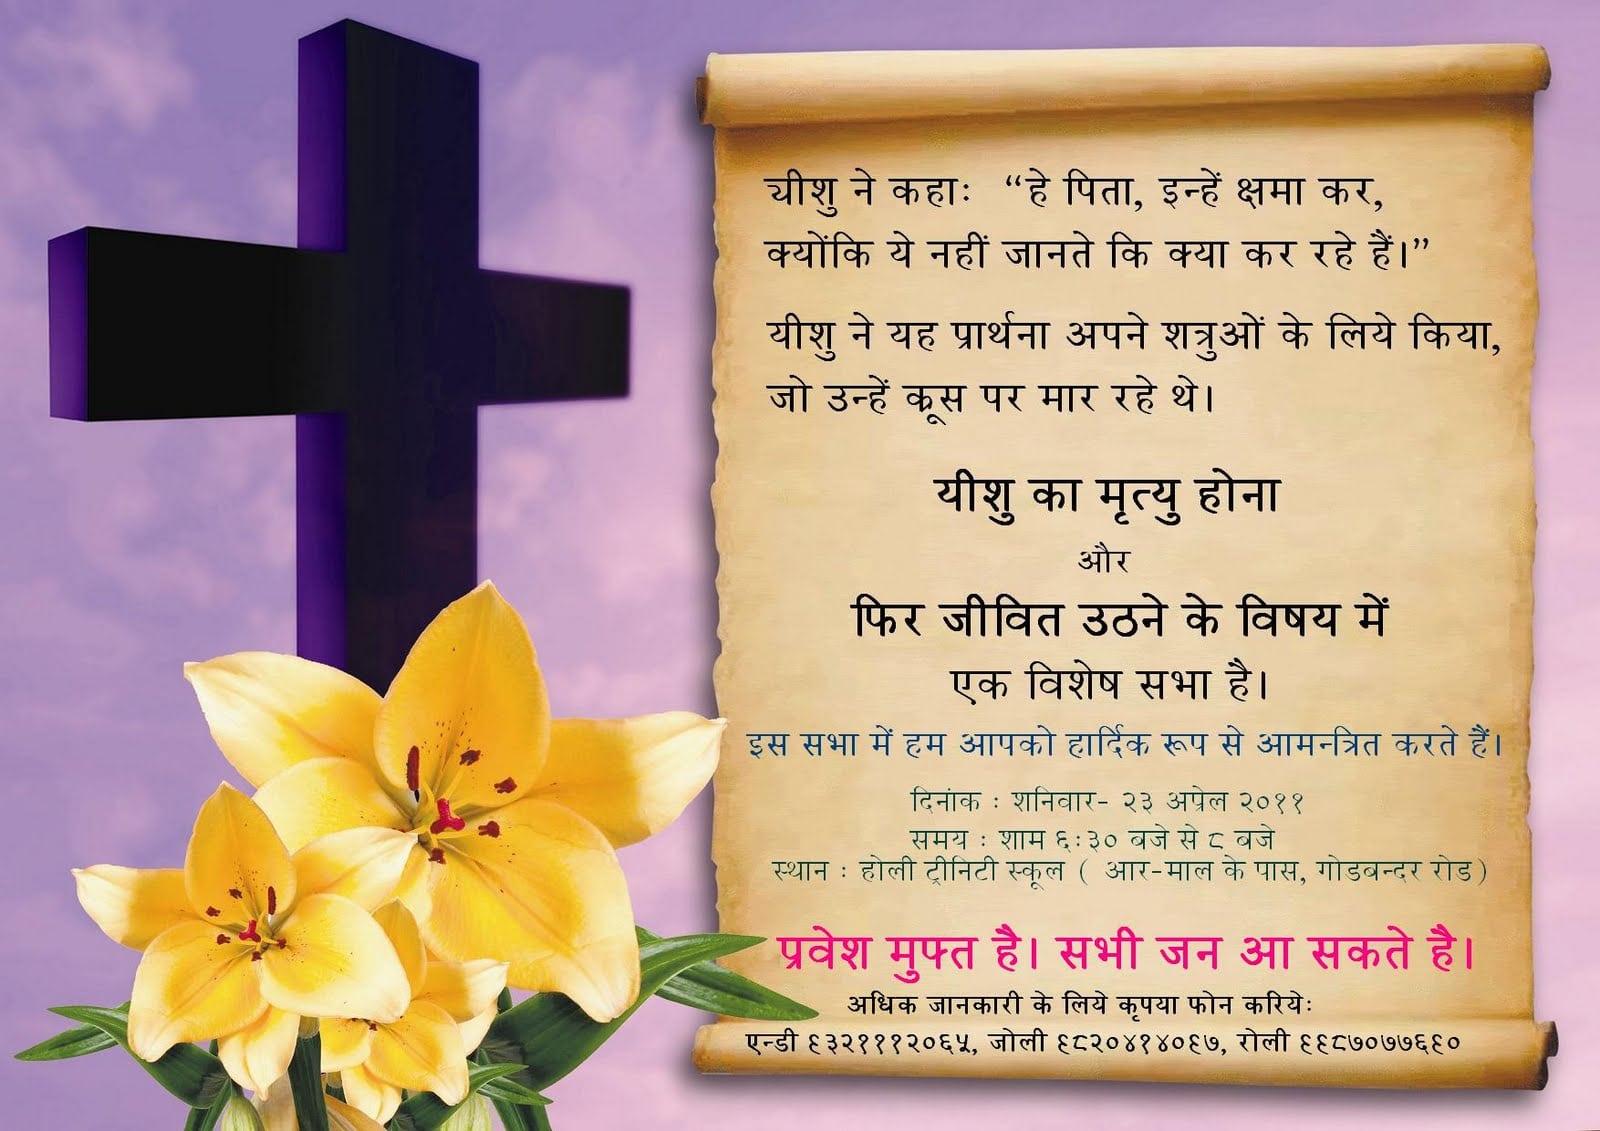 Original Diwali Party Invitation In Hindi Exactly Inspirational